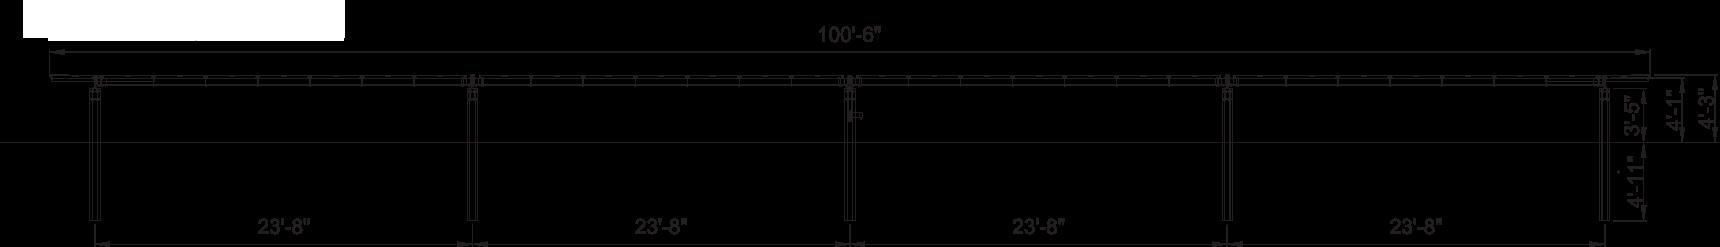 Single-Axis Solar Tracker   Valmont Utility